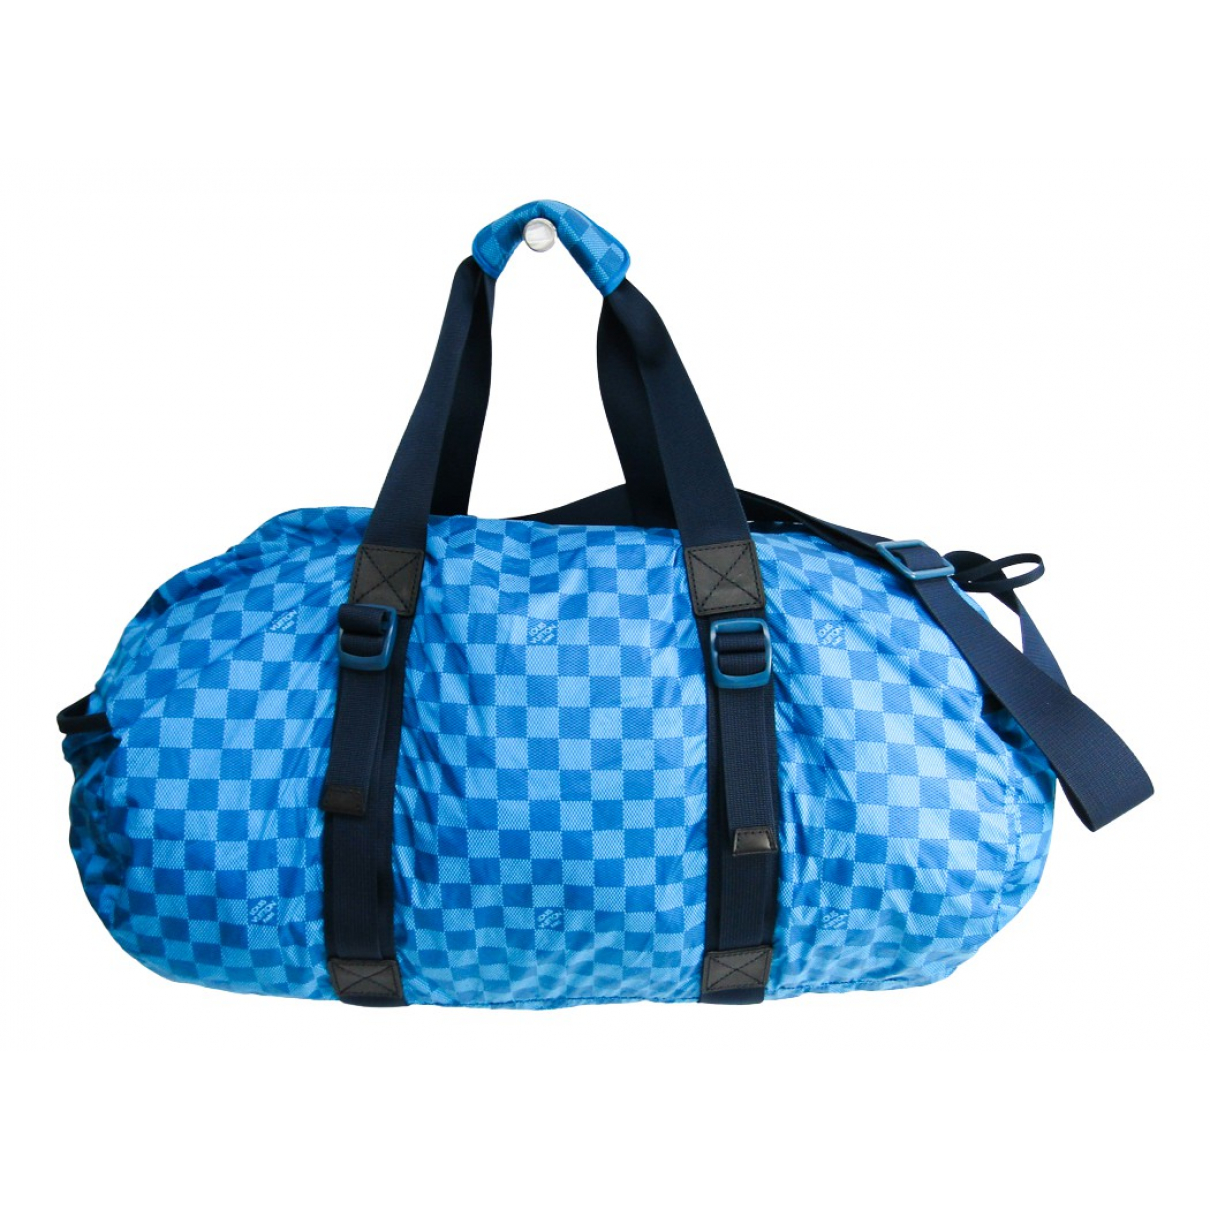 Louis Vuitton - Sac   pour homme en toile - bleu